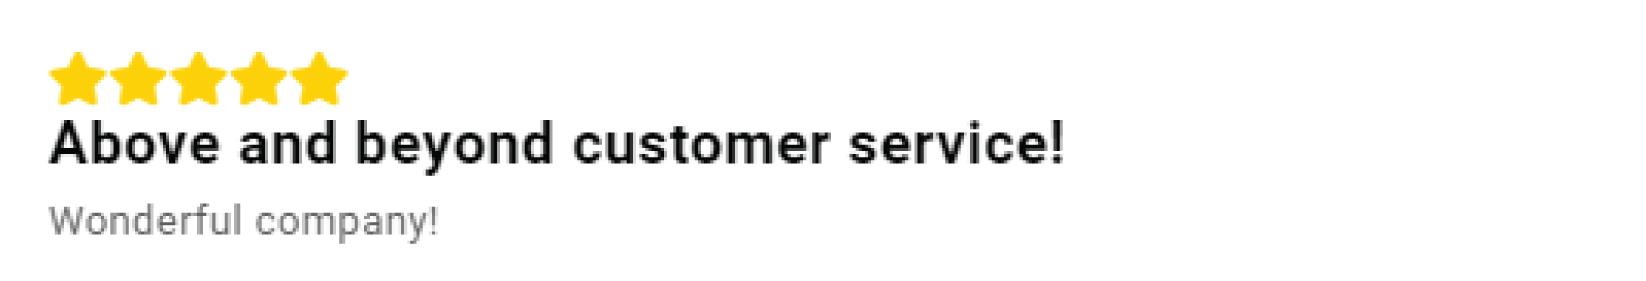 feefo review customer service feedback name label stars